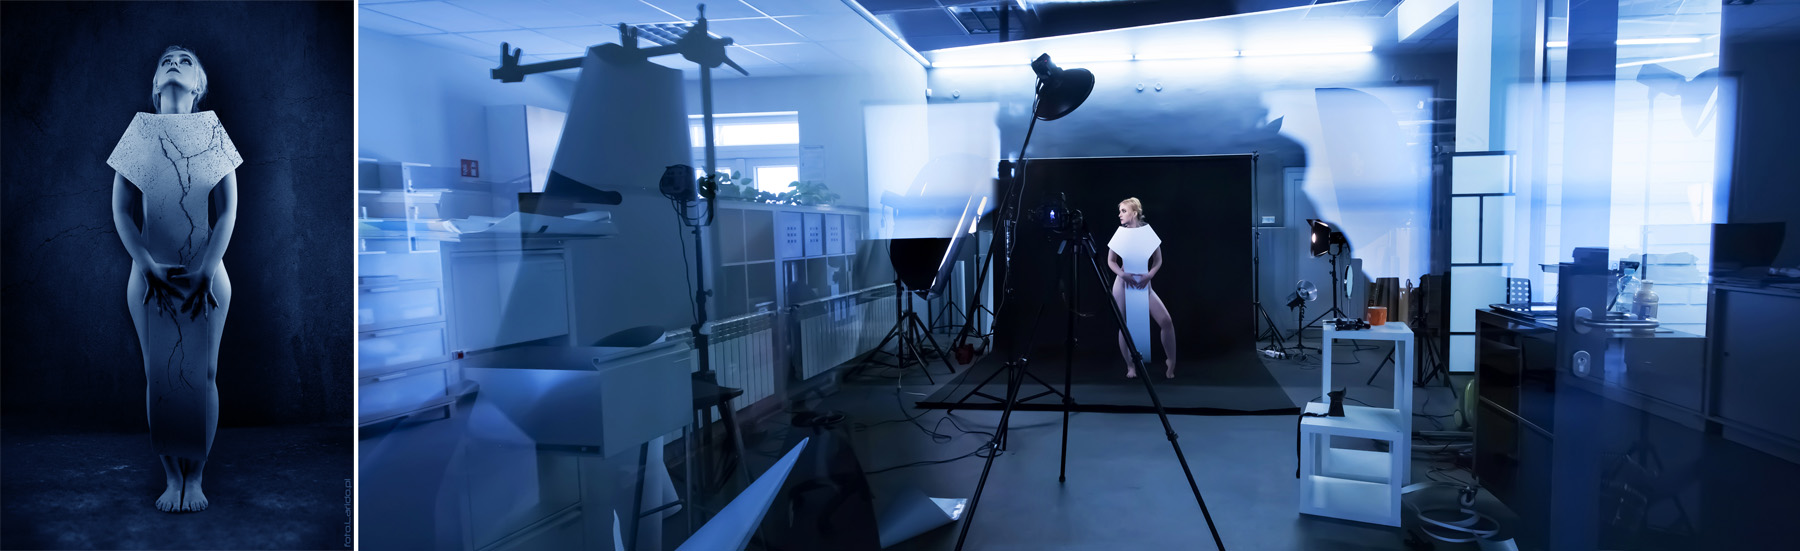 backstage - fotografia portretowa w studio